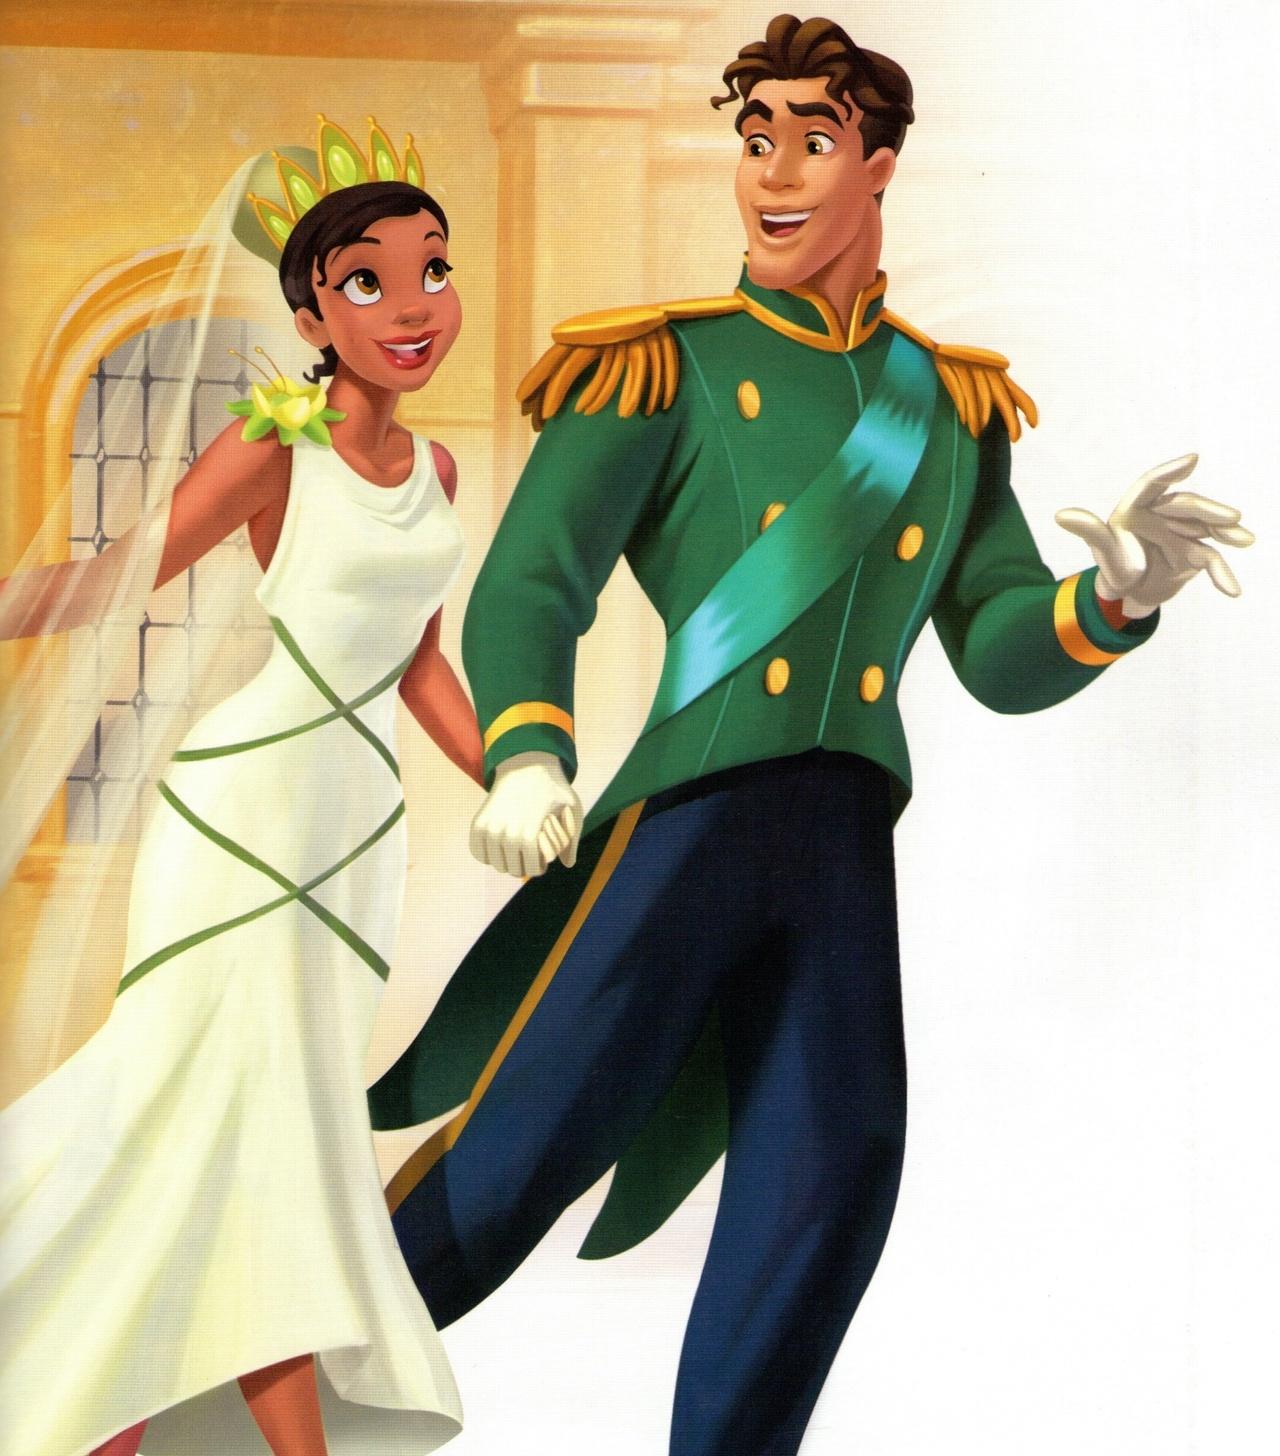 Tiana and Naveen - The Princess and the Frog Photo ...